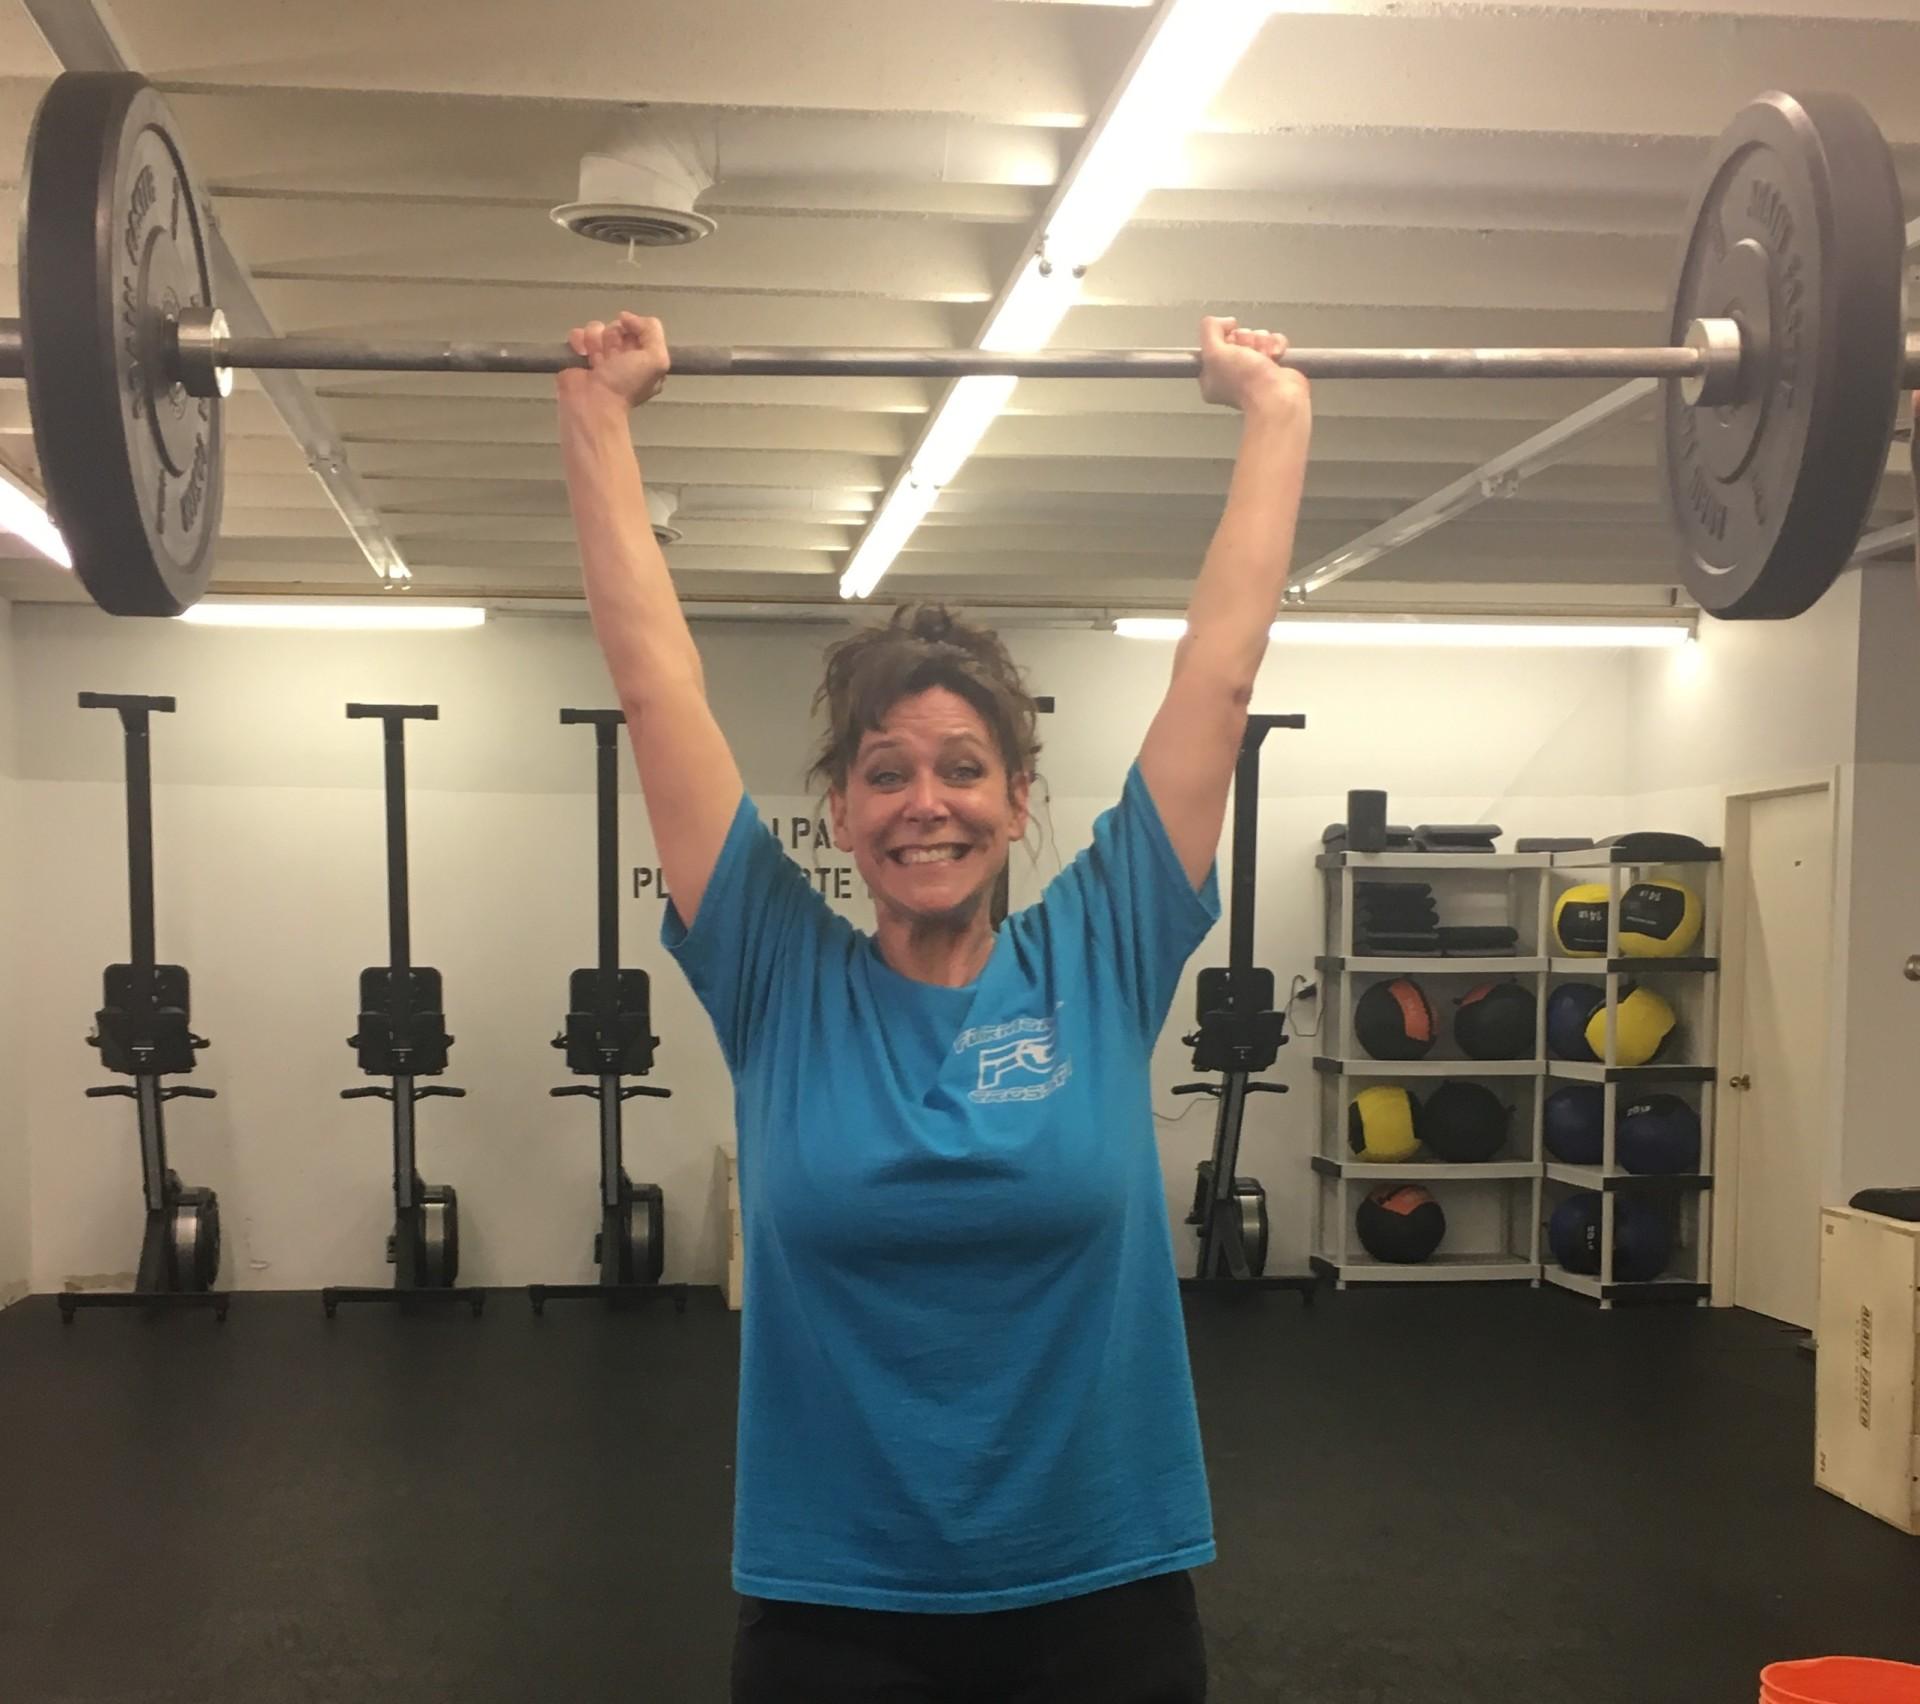 February Athlete of the Month - Shawna Hannaman